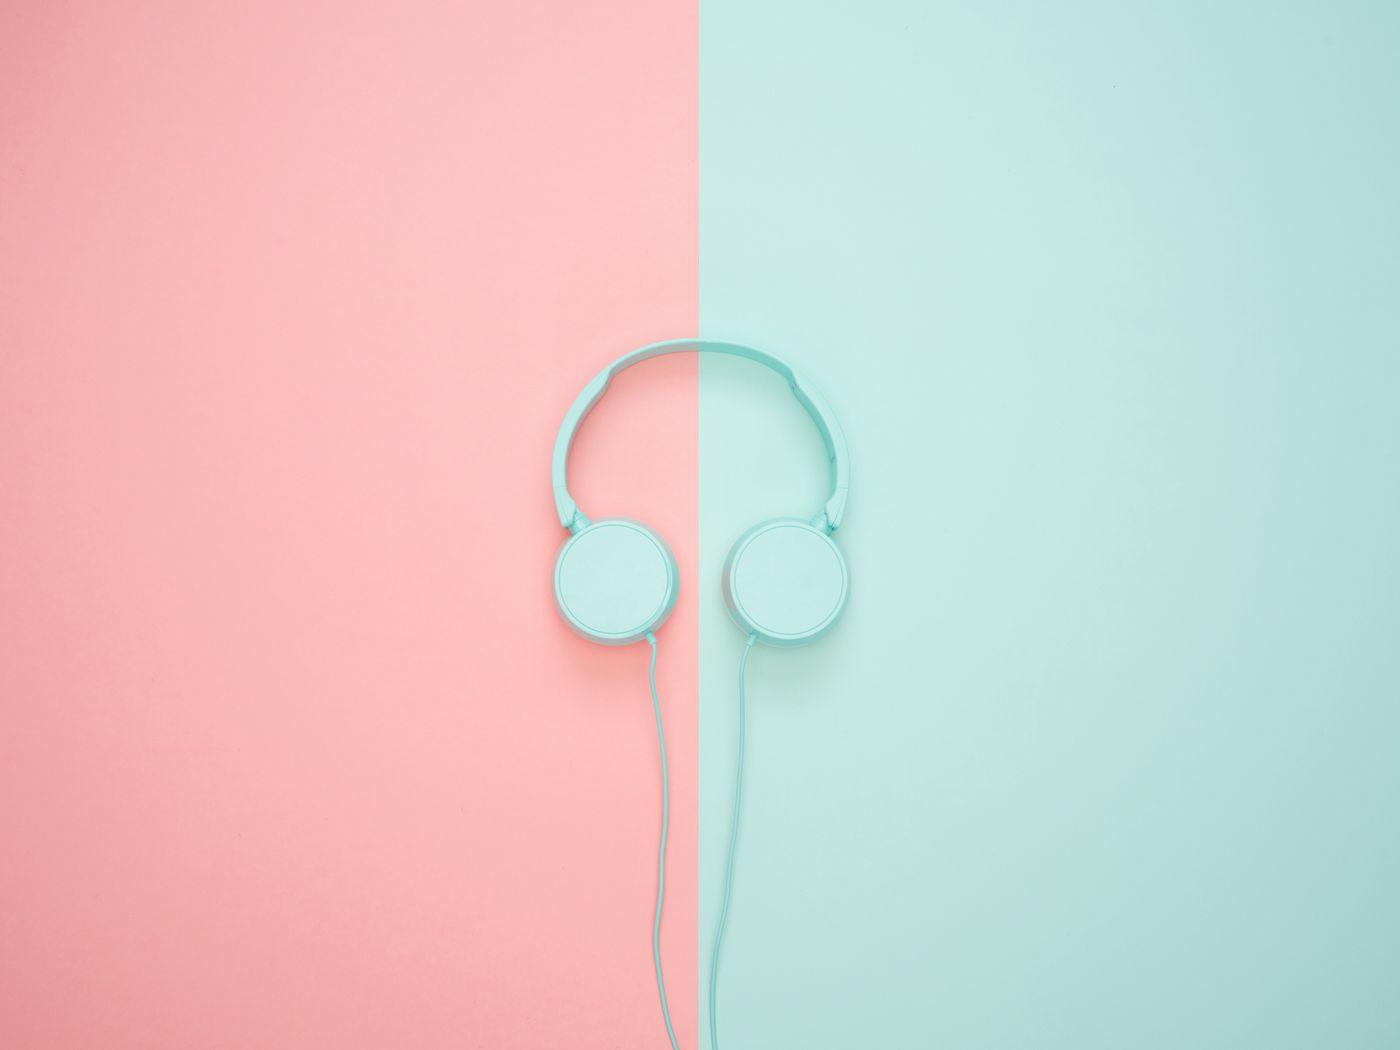 1400x1050 Wallpaper headphones, minimalism, pastel, pink